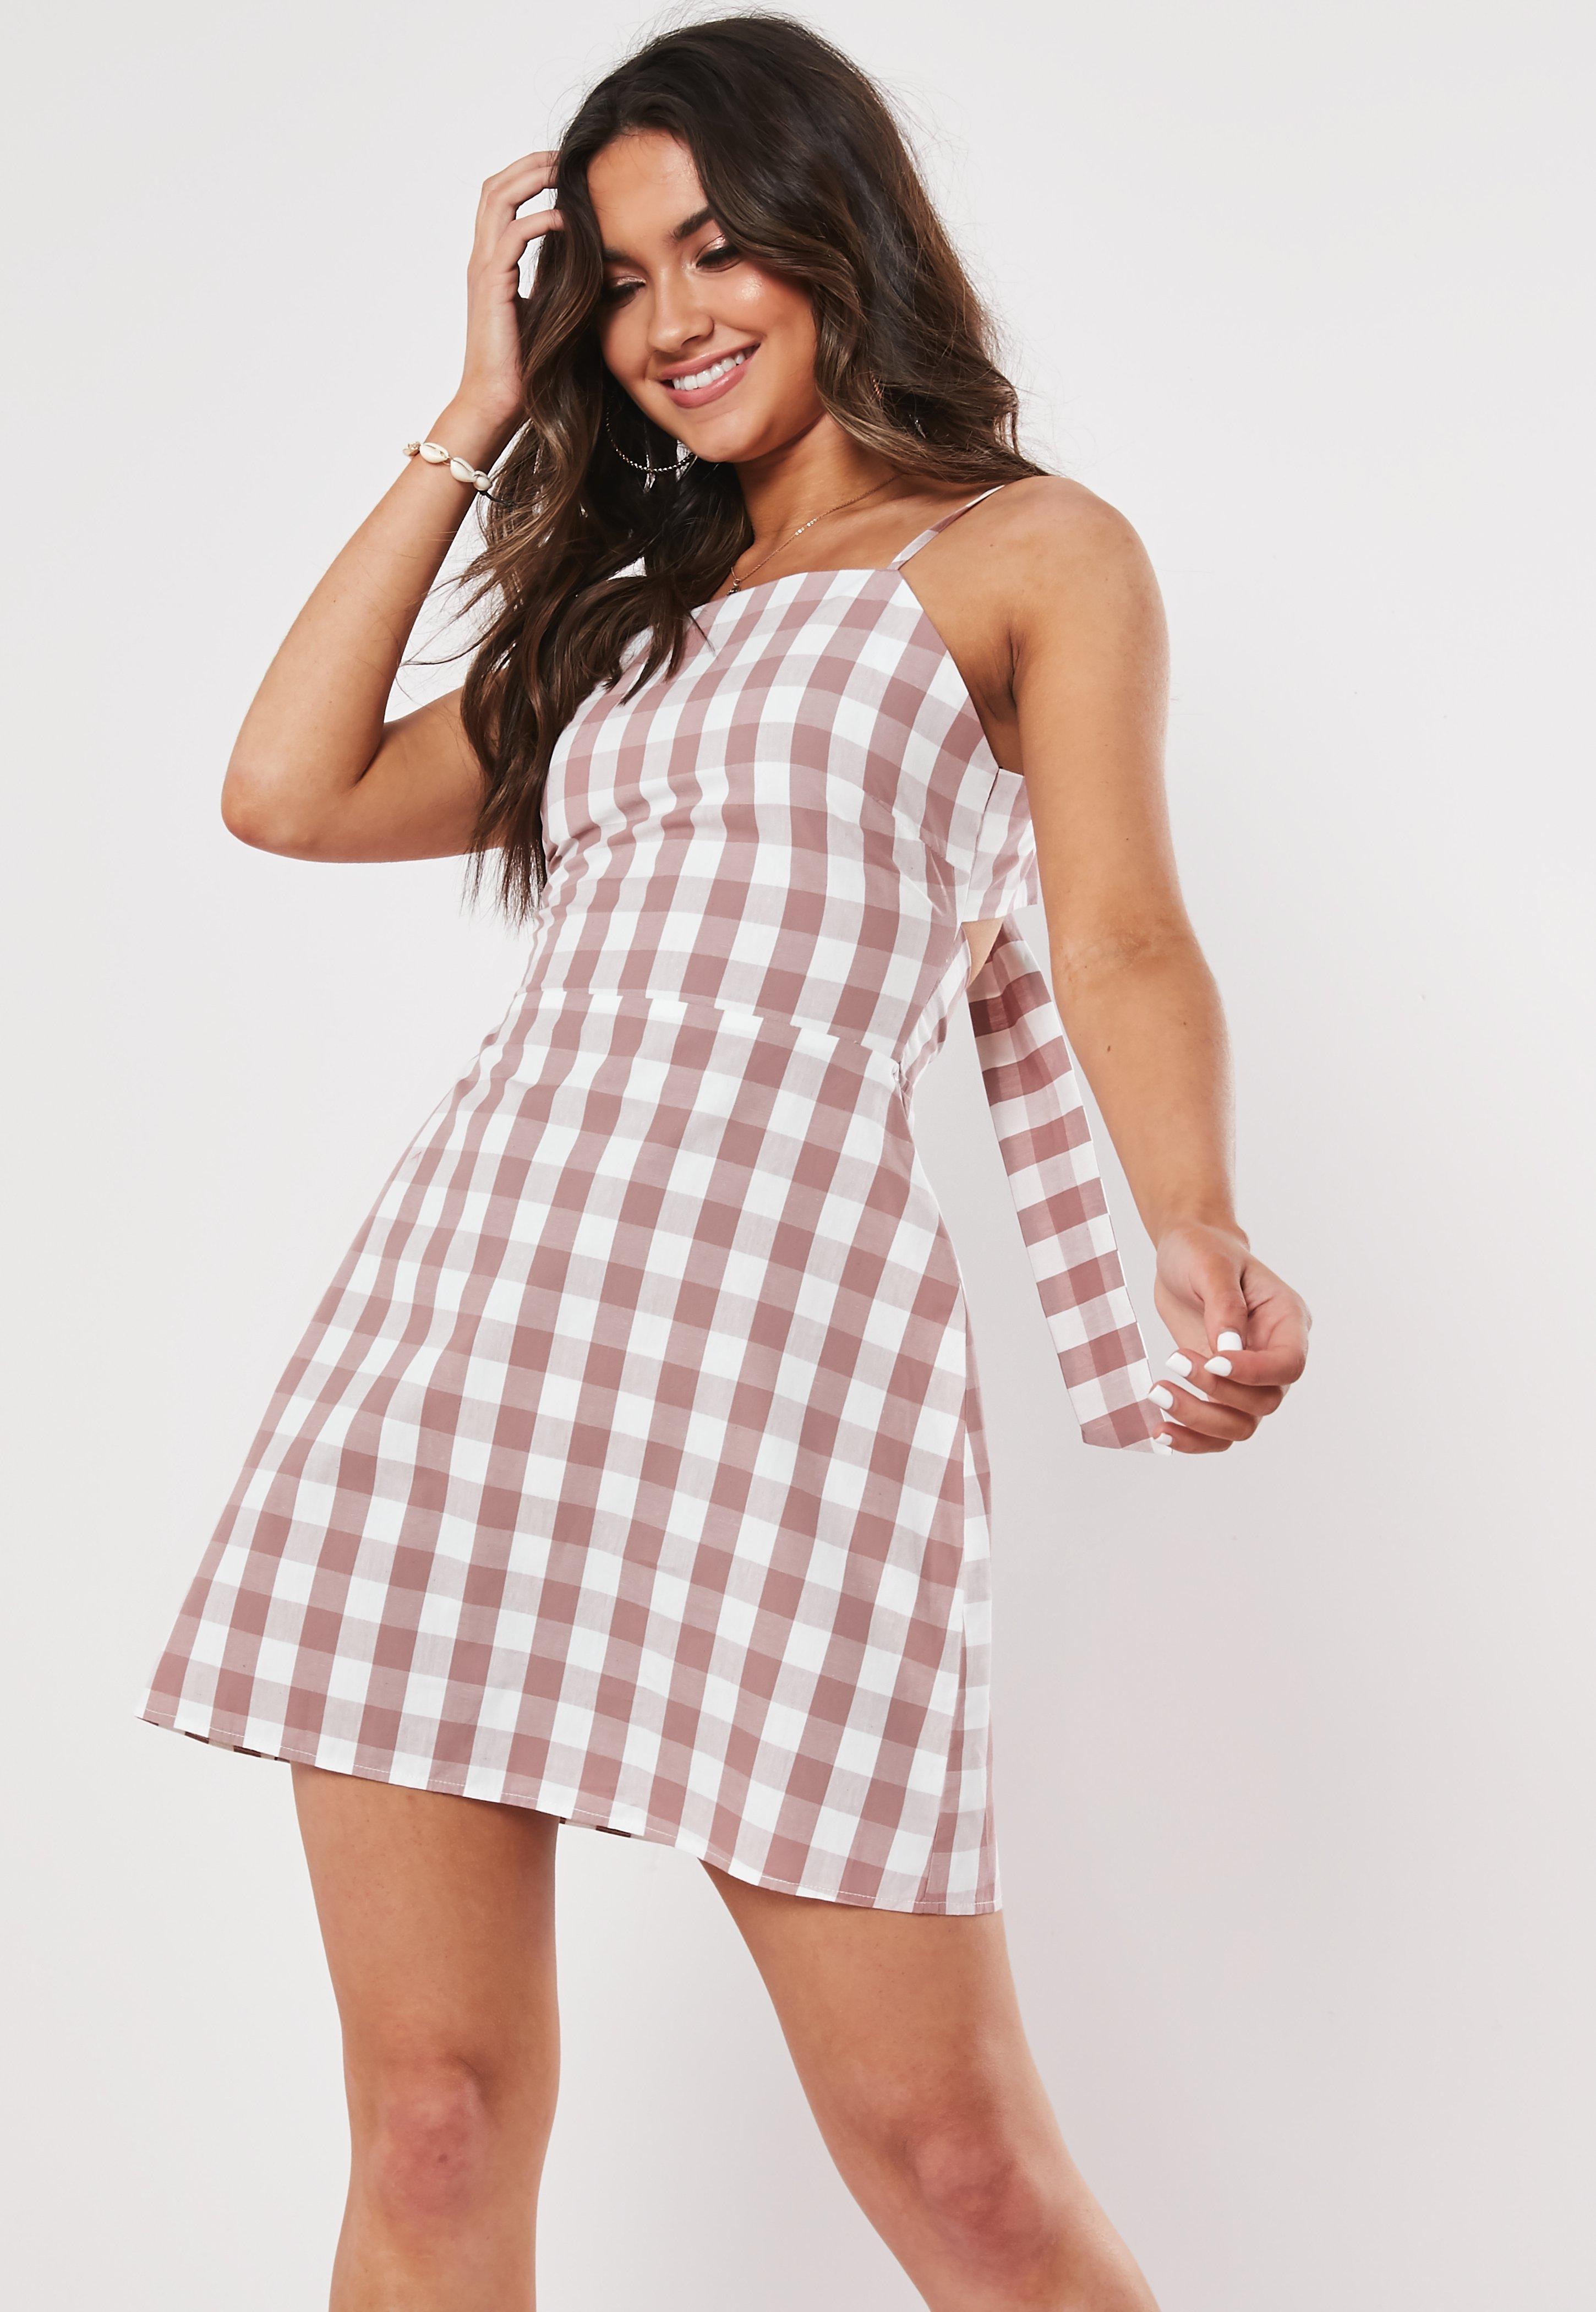 bac5bf498f3c3 Beach Dresses - Light Dresses & Cover Ups | Missguided